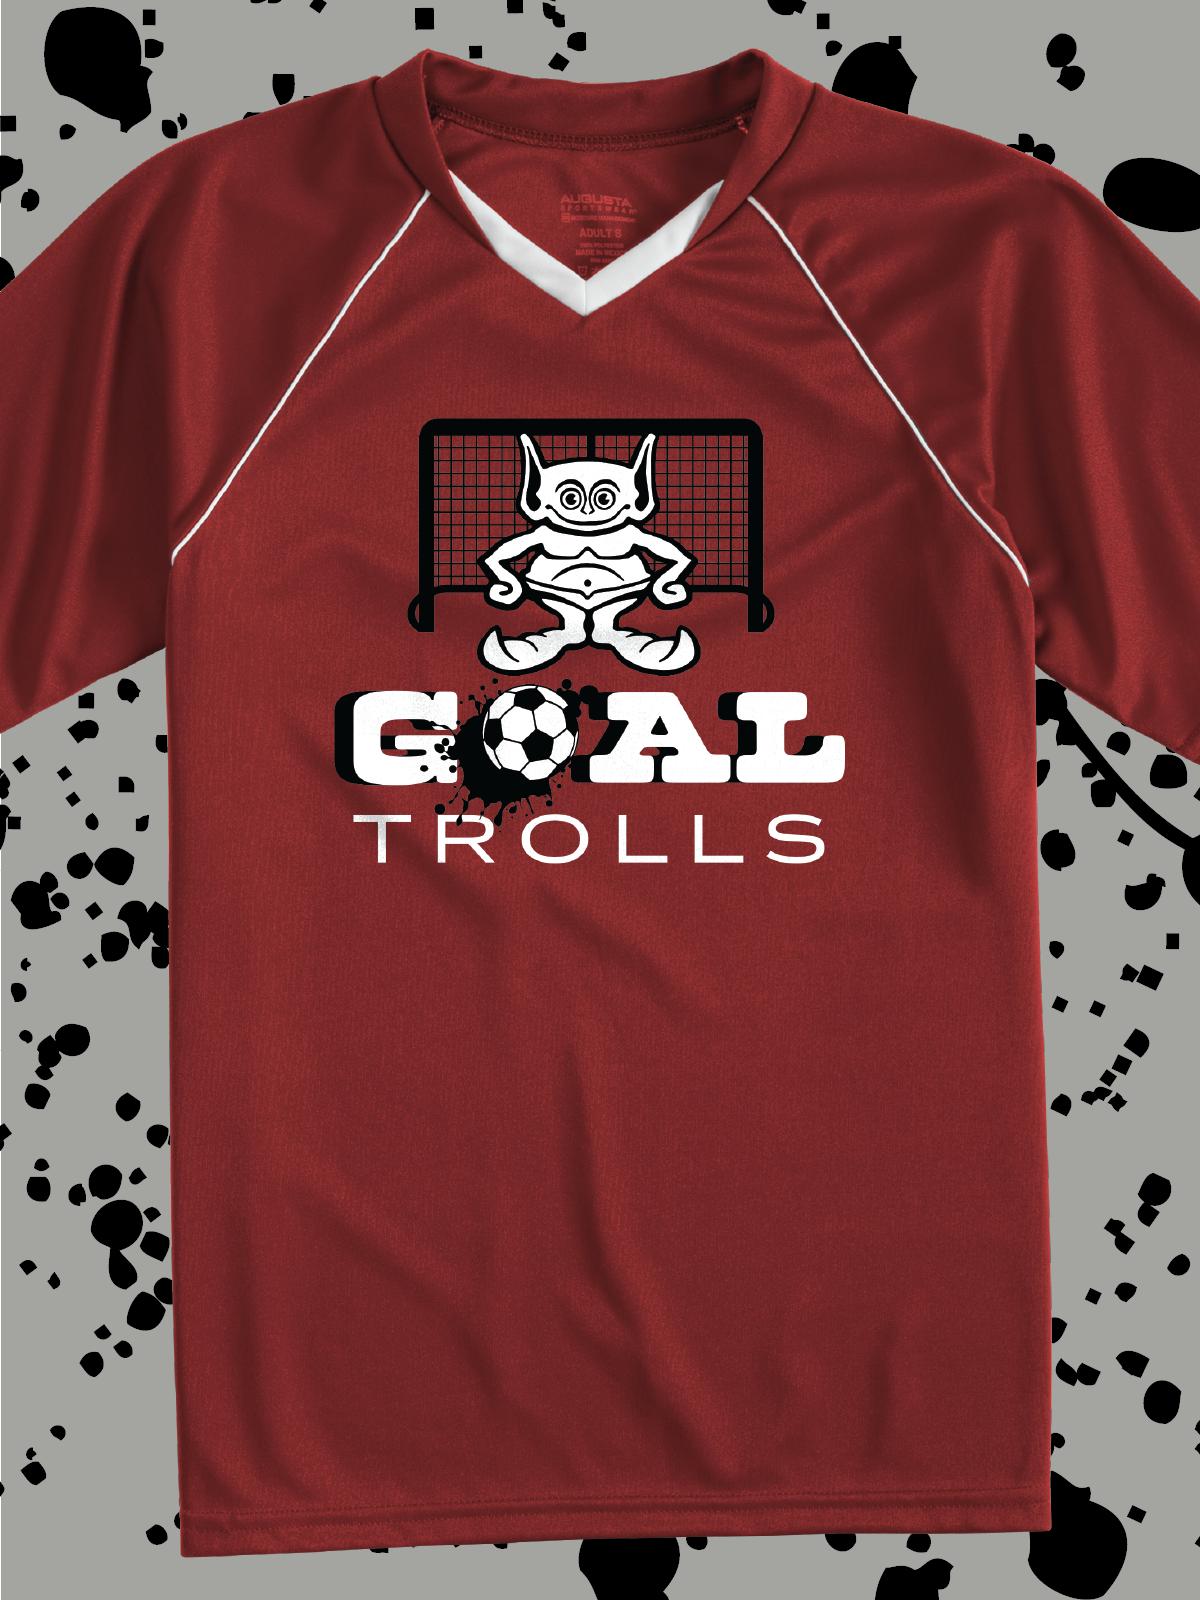 Goal Trolls Funny Design Idea For Custom Soccer Jerseys Team Shirts T Shirts Hoodies Bags Water Bottles And More Team T Shirts Shirt Designs Shirts